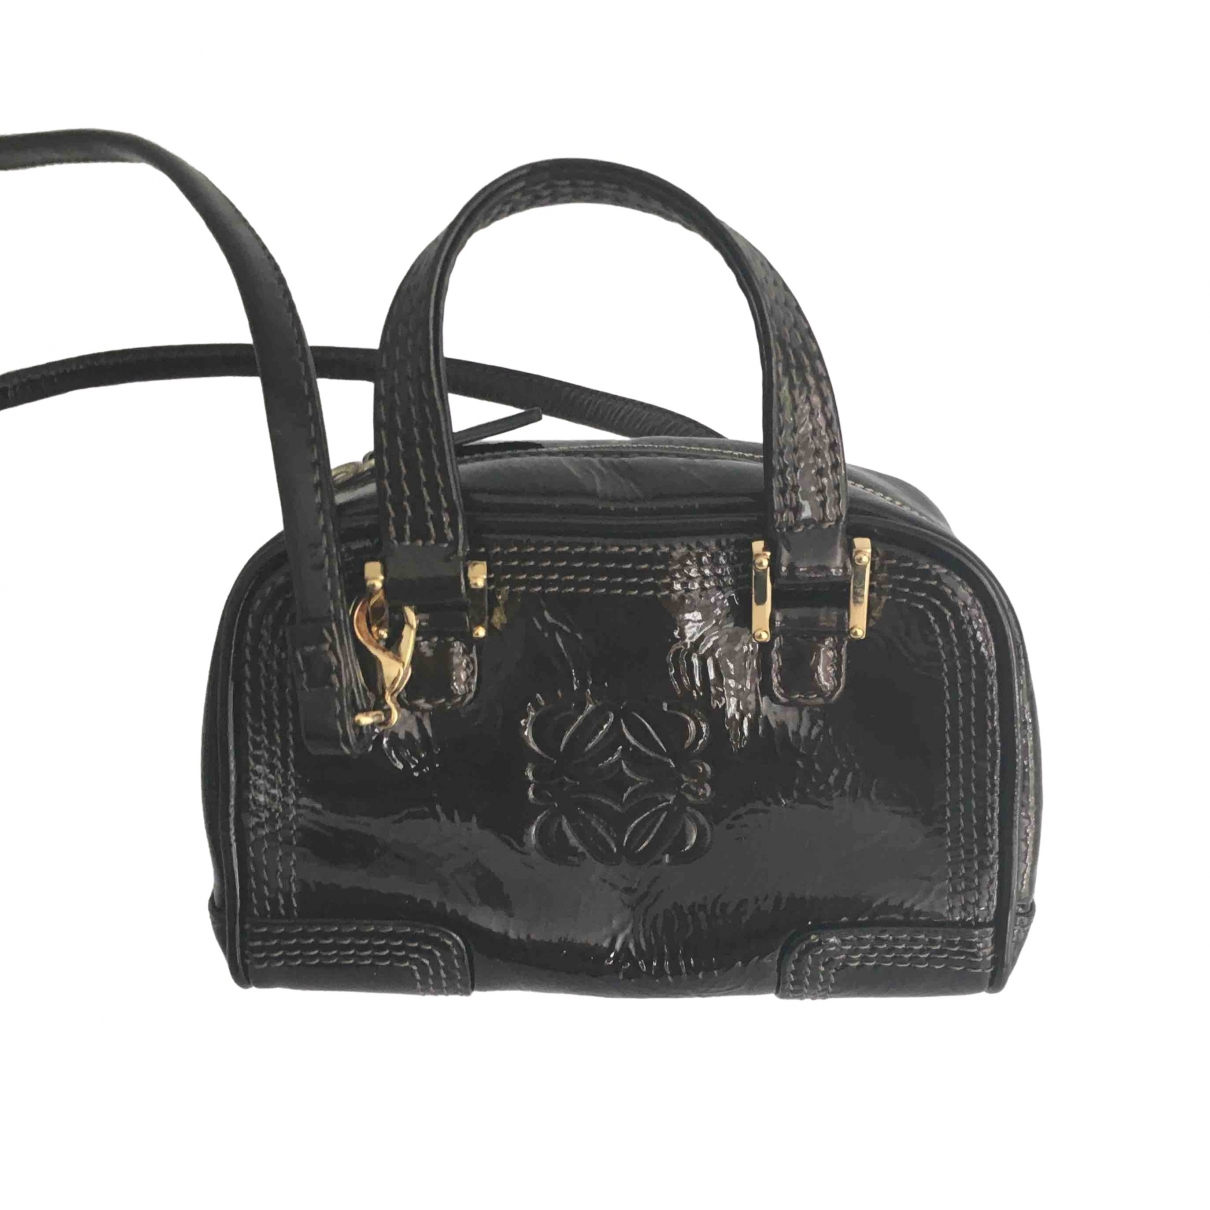 Loewe Amazona Brown Patent leather handbag for Women \N